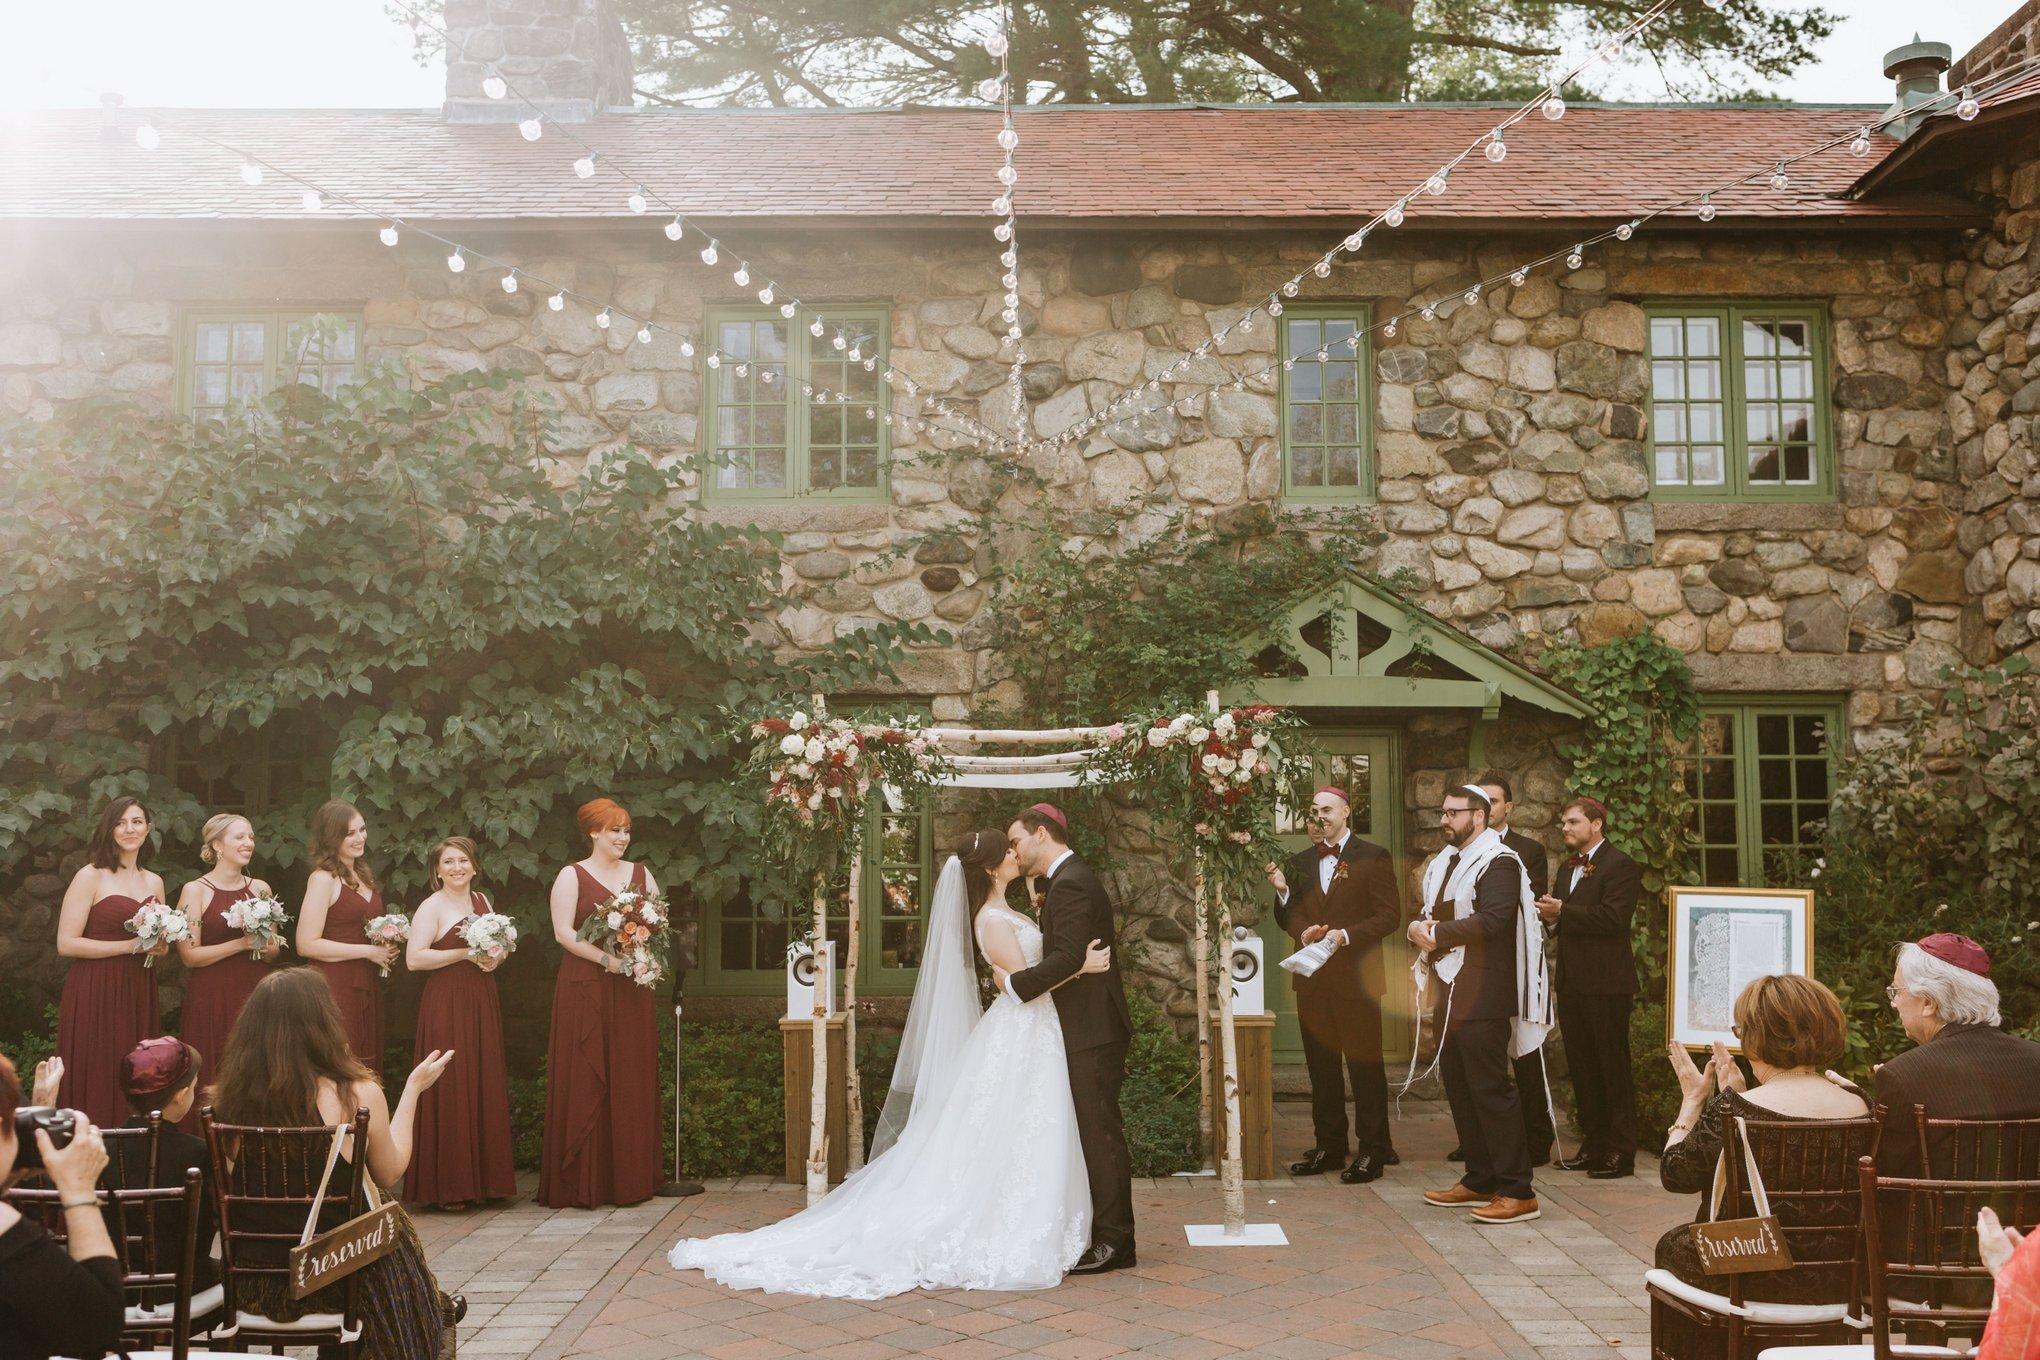 Willowdale-Estate-Wedding-Photographer-31.jpg